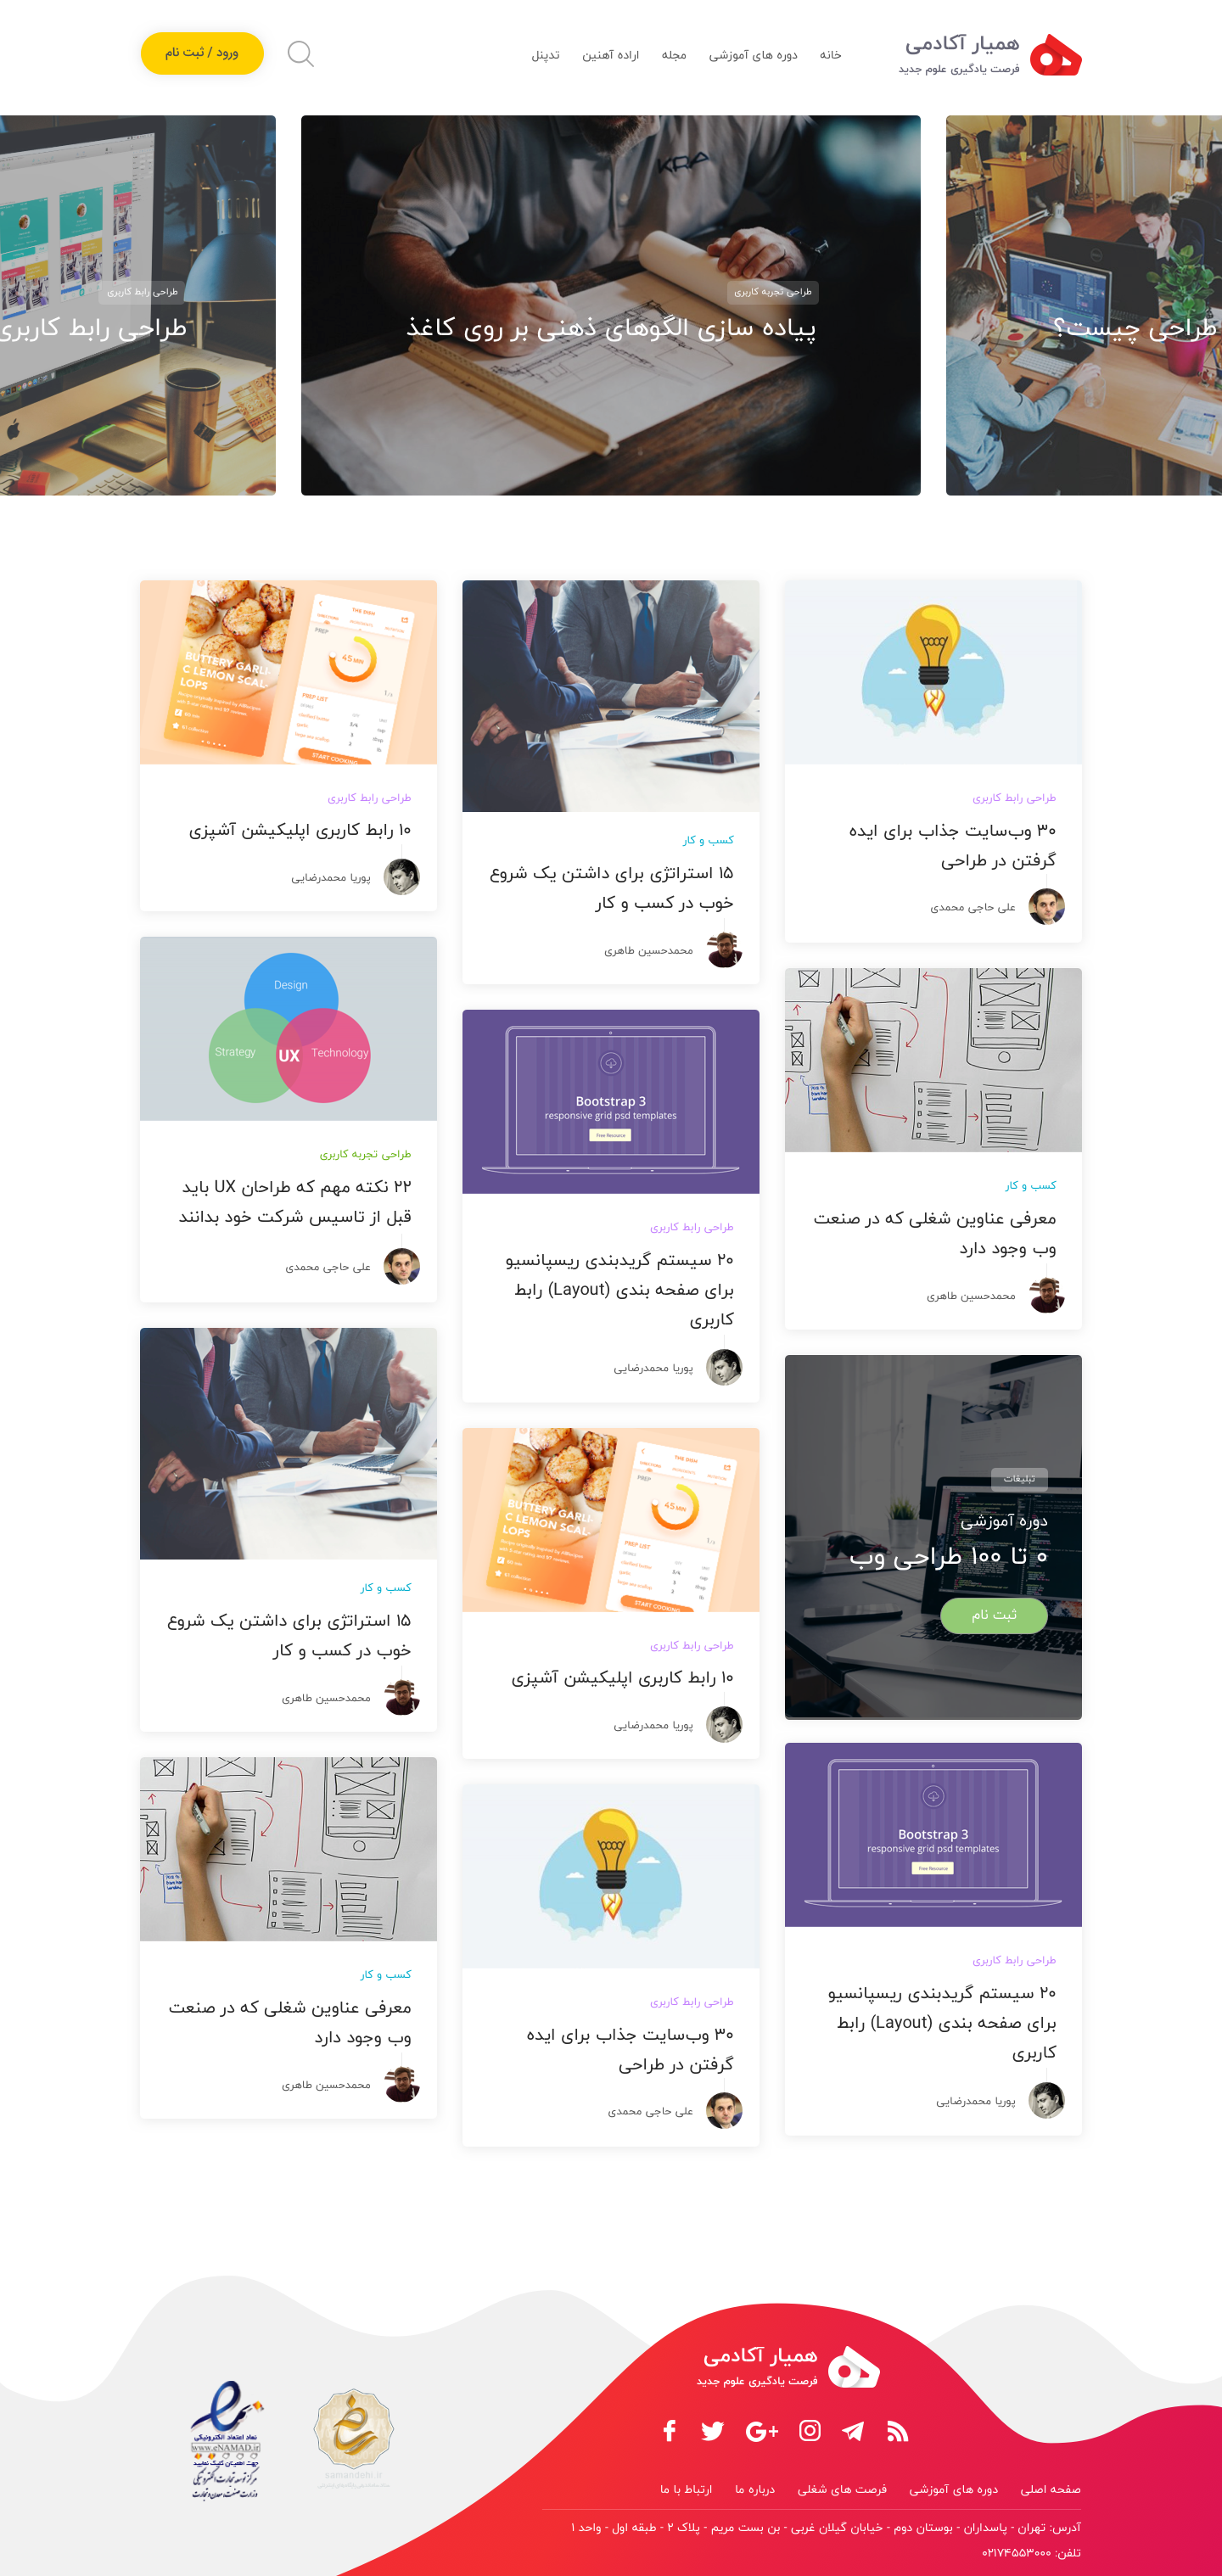 Hamyar blog